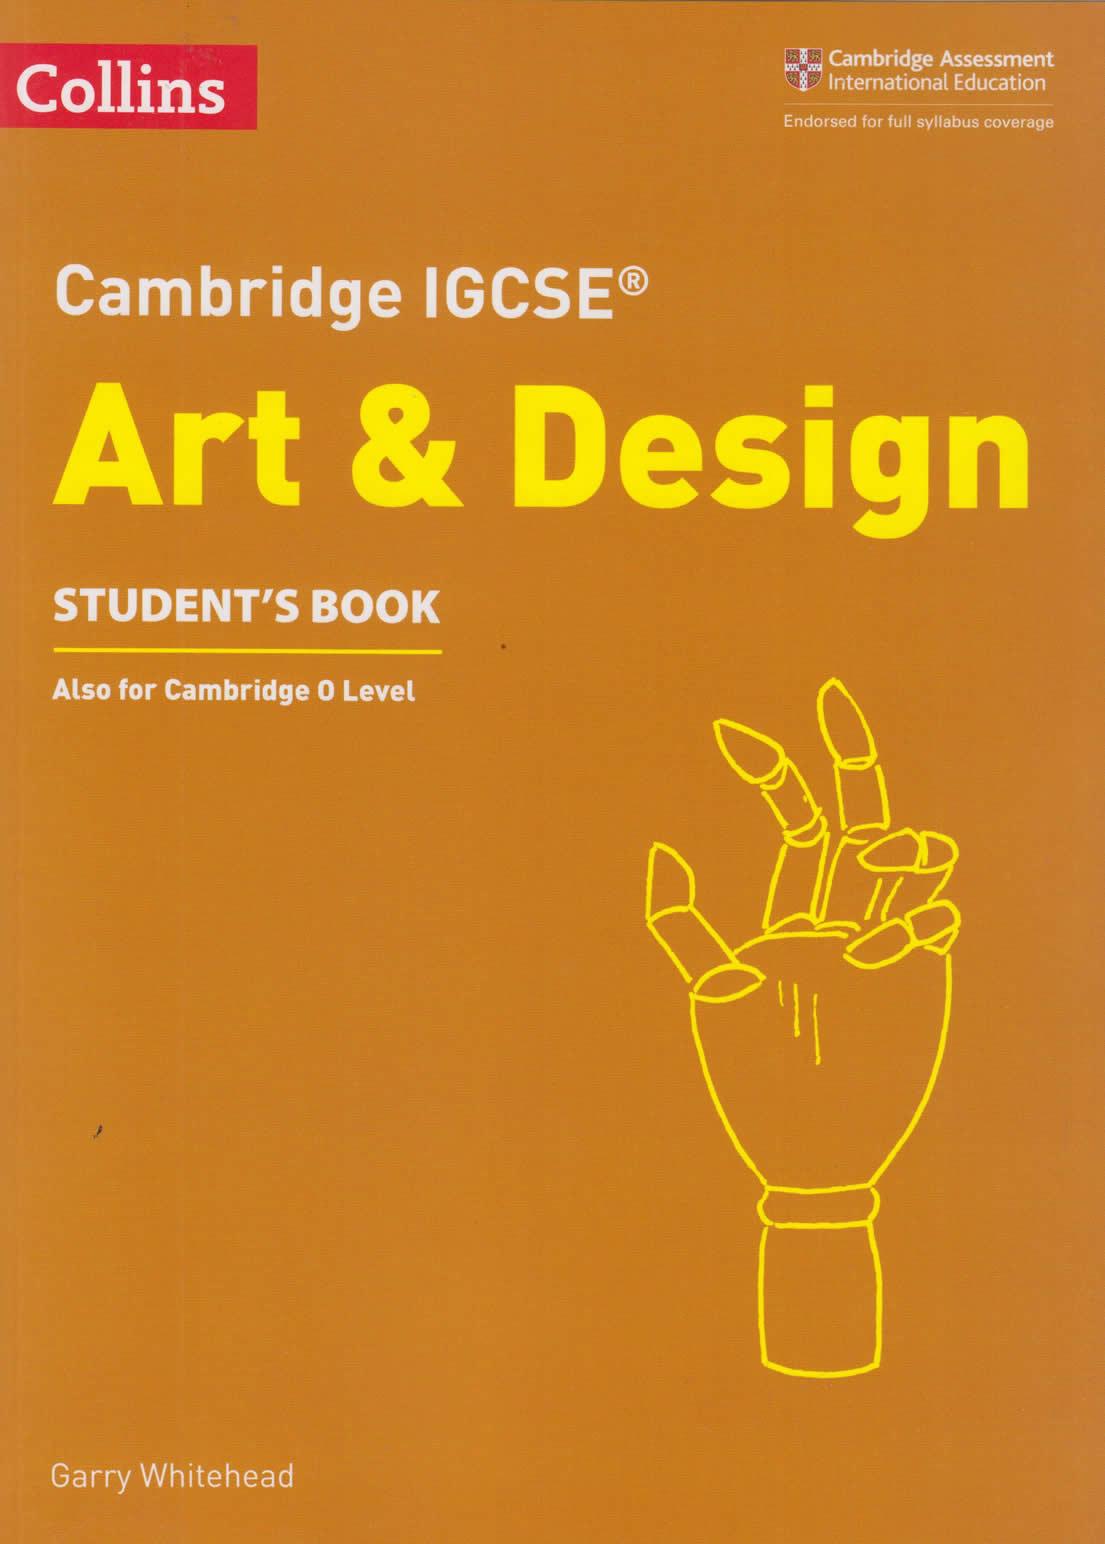 igcse cambridge student text books students centre